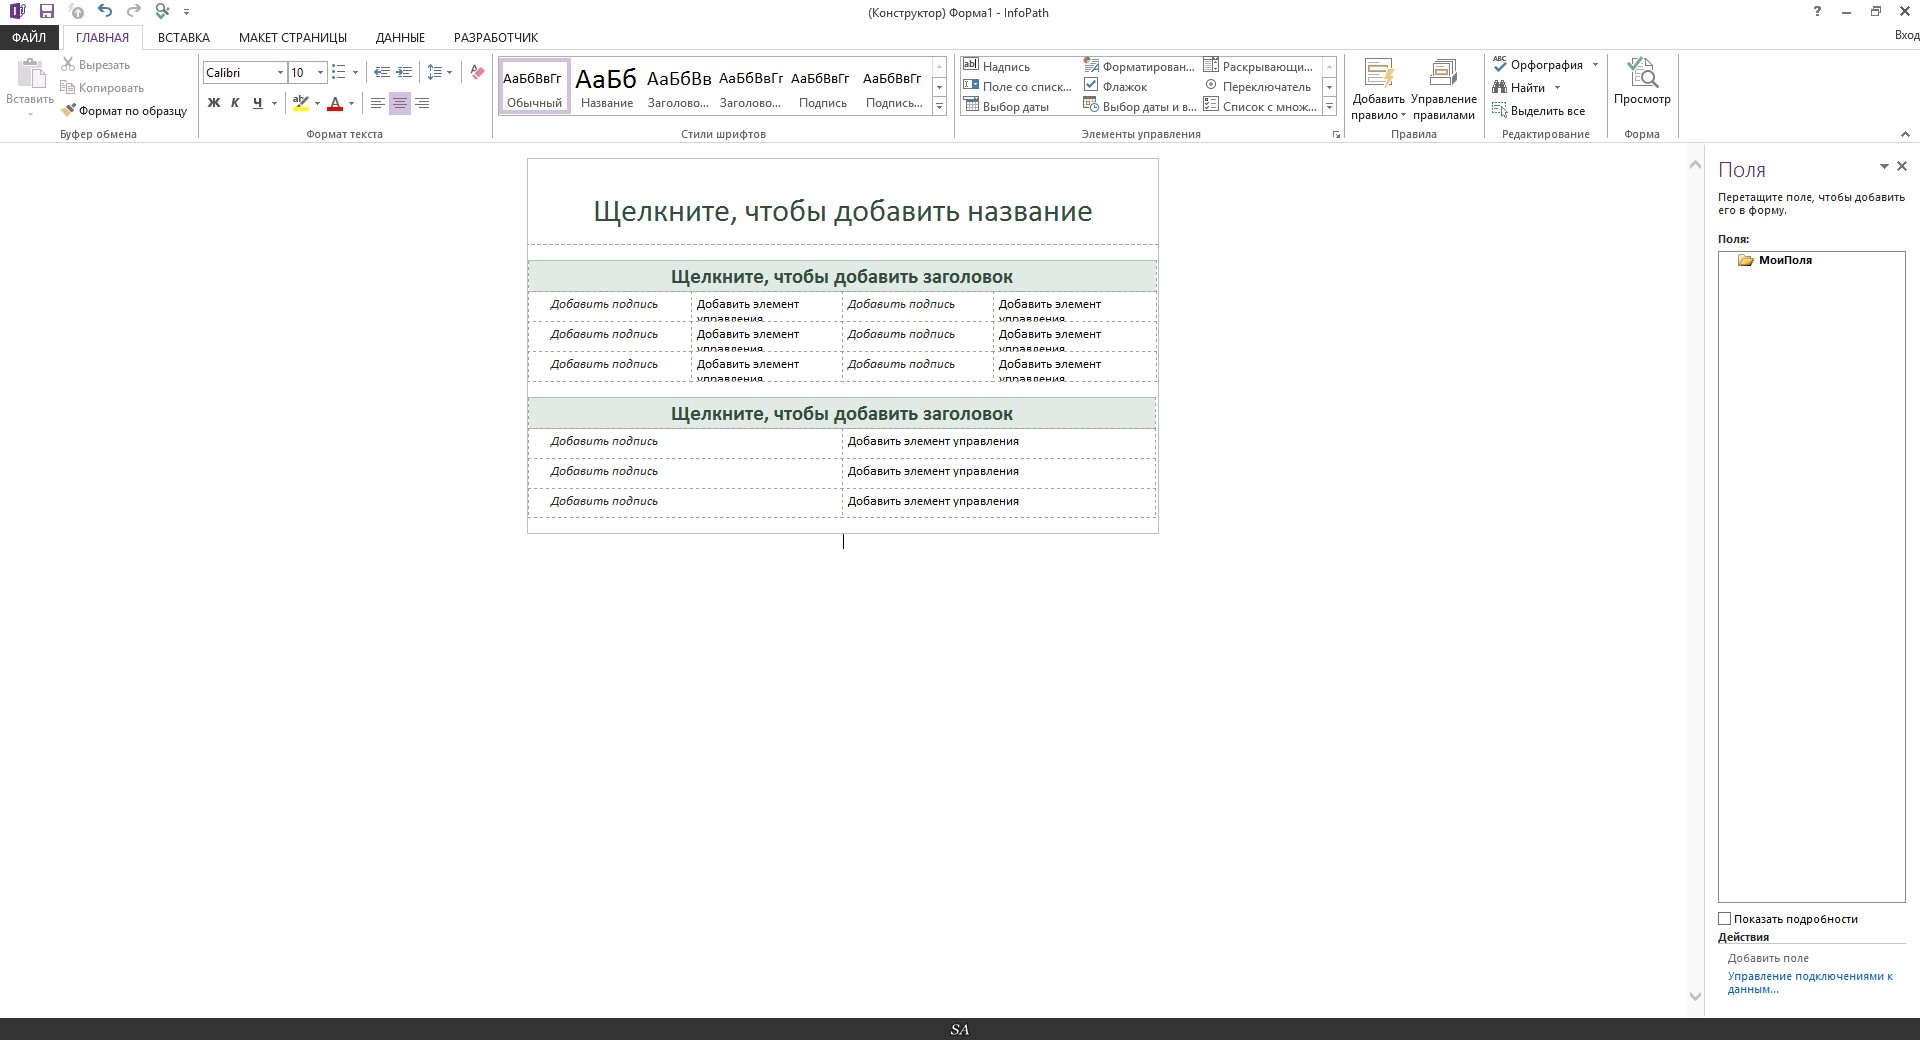 http://fs2.directupload.net/images/150213/q5qs3w8x.jpg